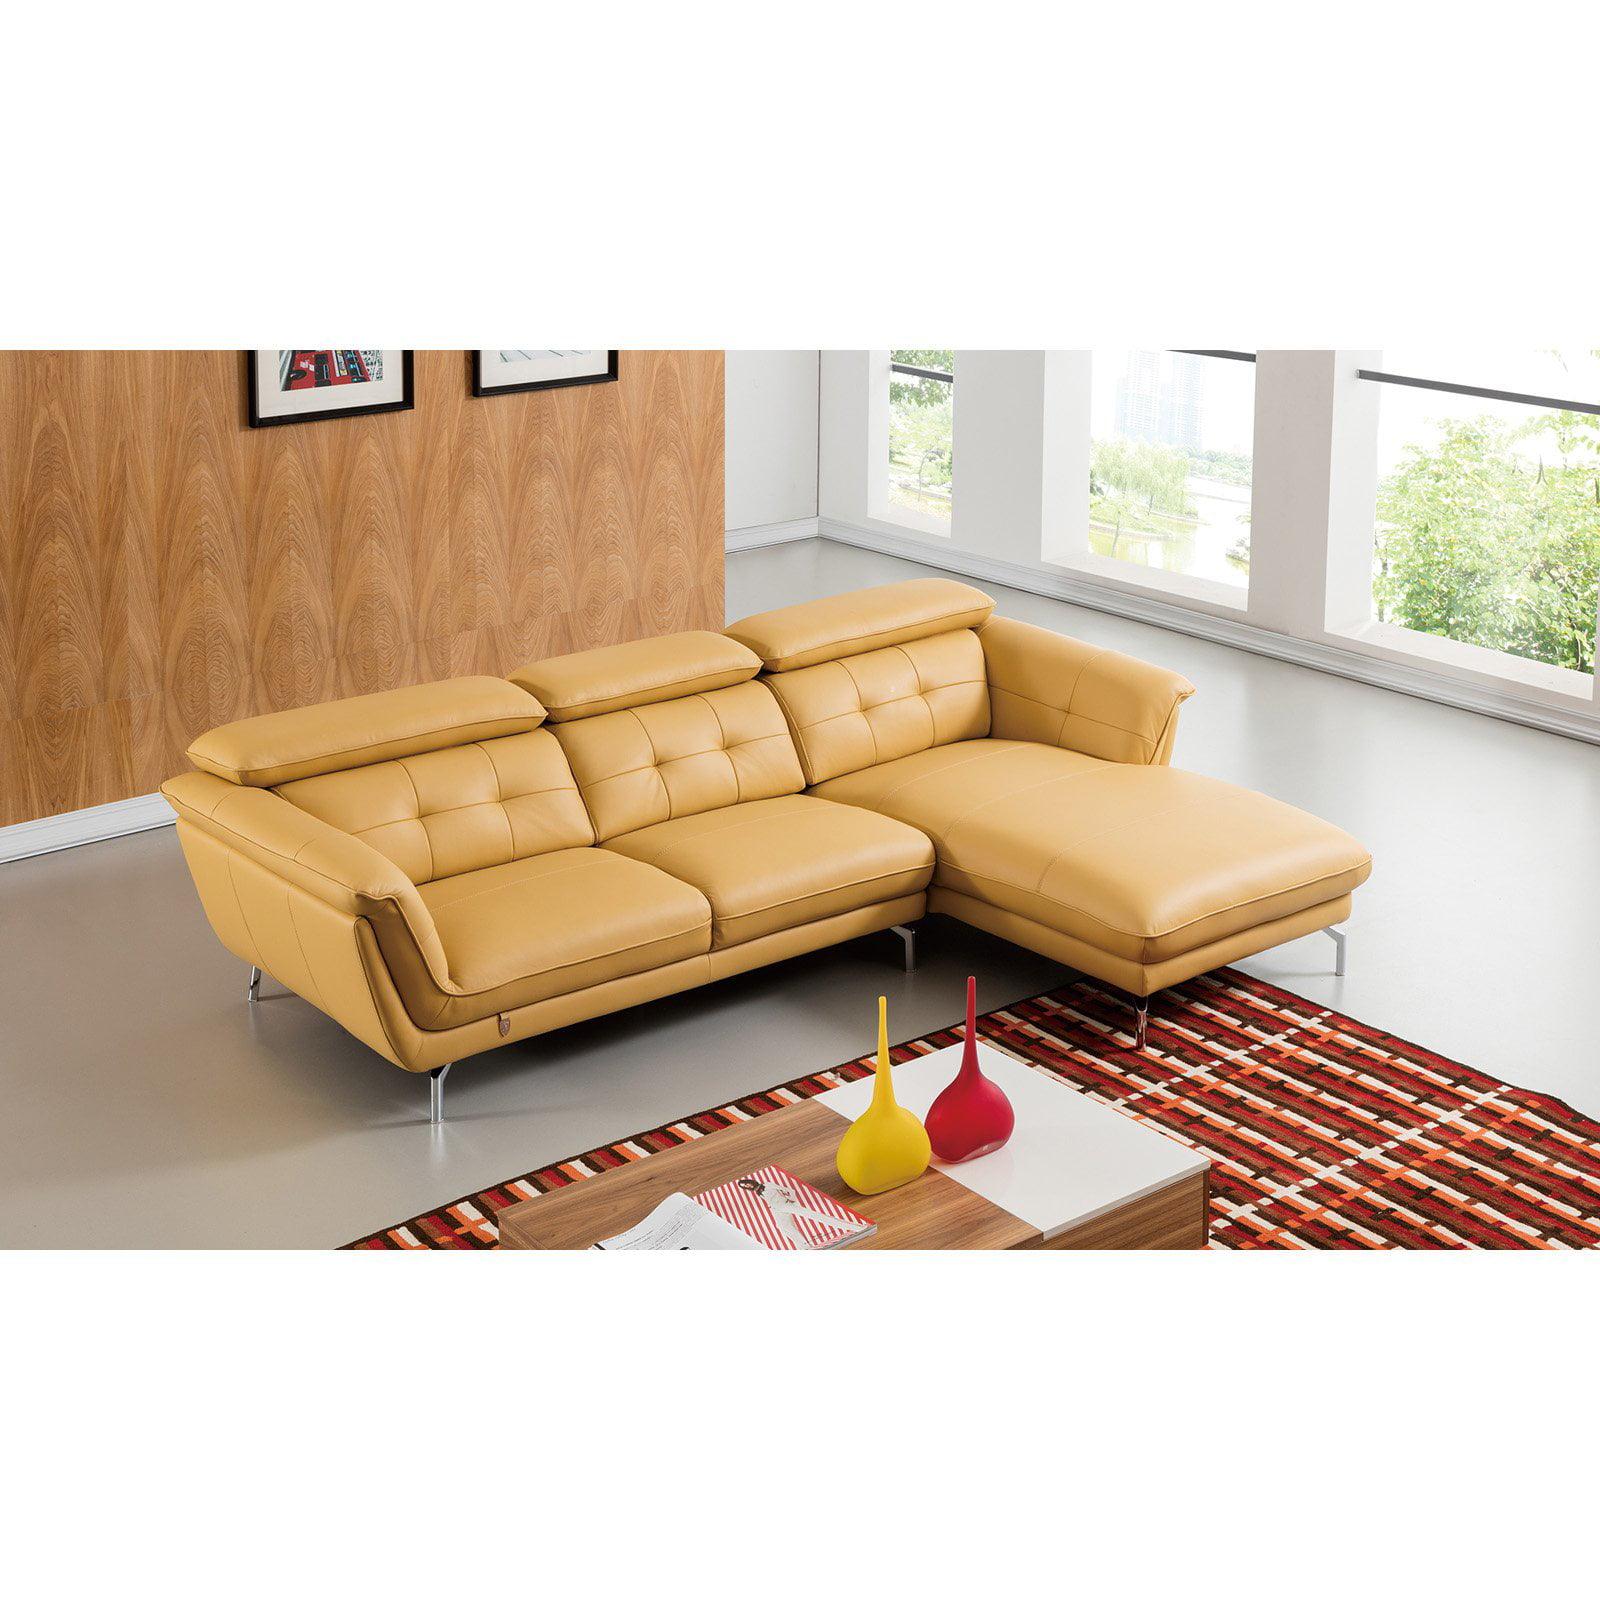 American Eagle Furniture Callahan Italian Leather Sectional Sofa